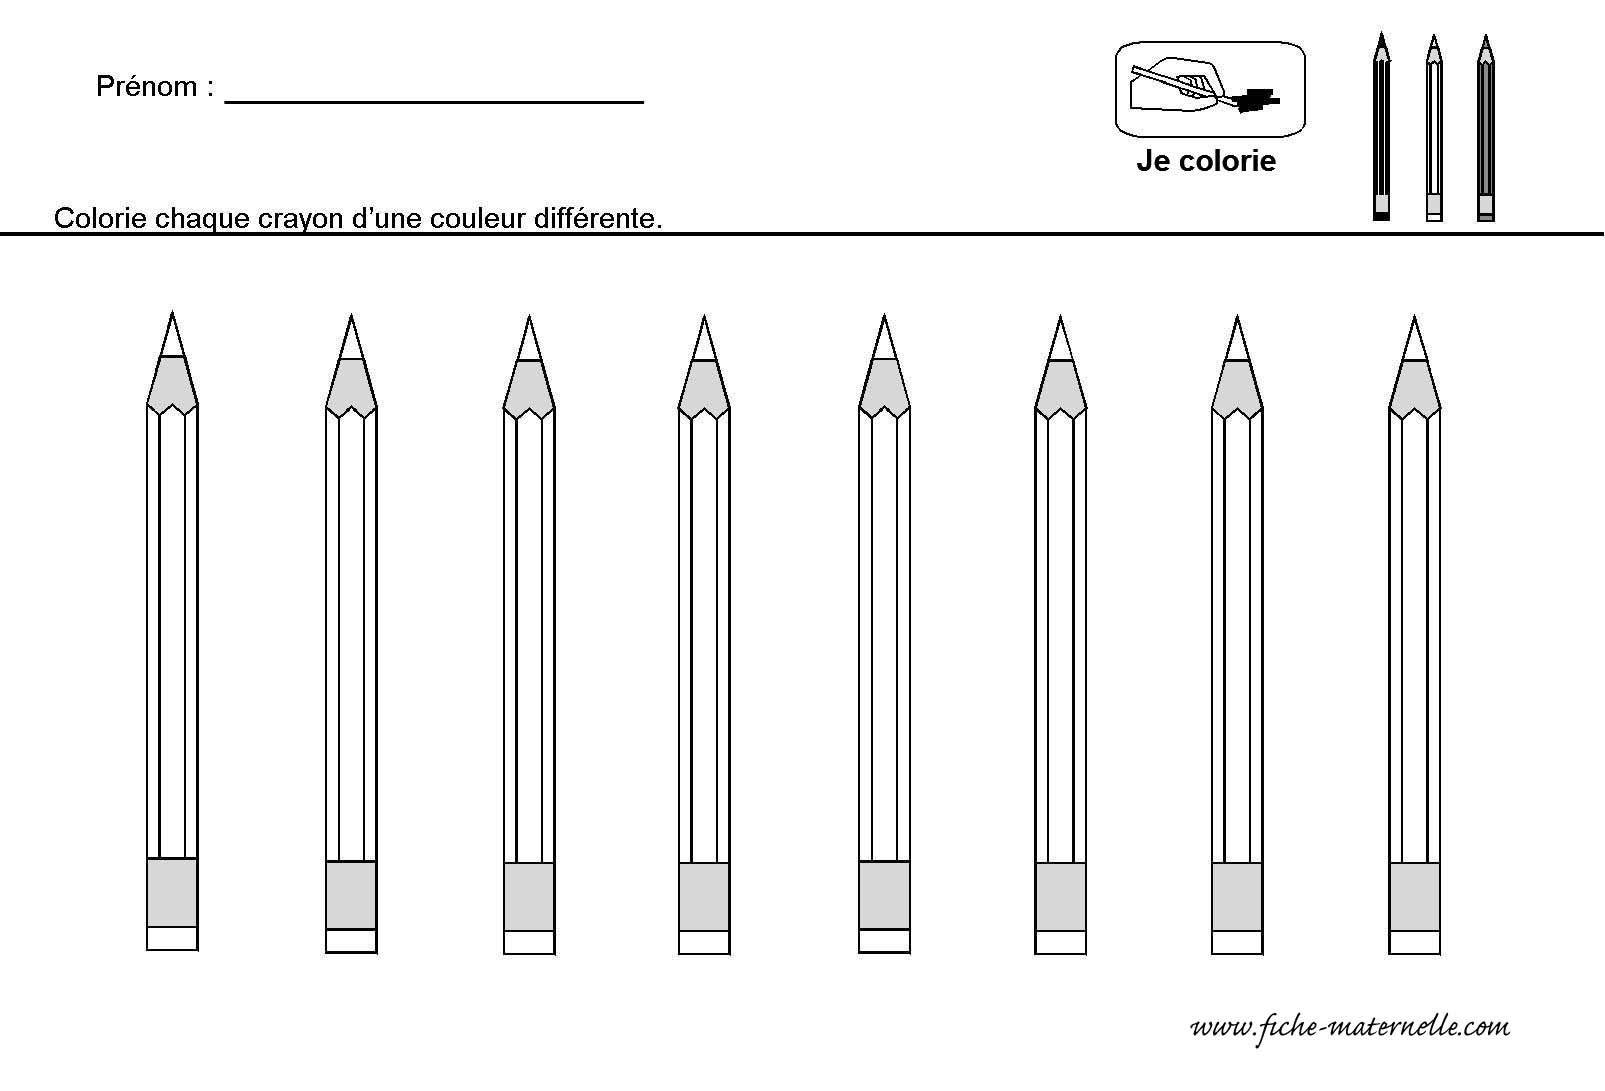 Crayons De Couleur | Kleurplaten, Potlood, Kleuren destiné Crayon De Coloriage